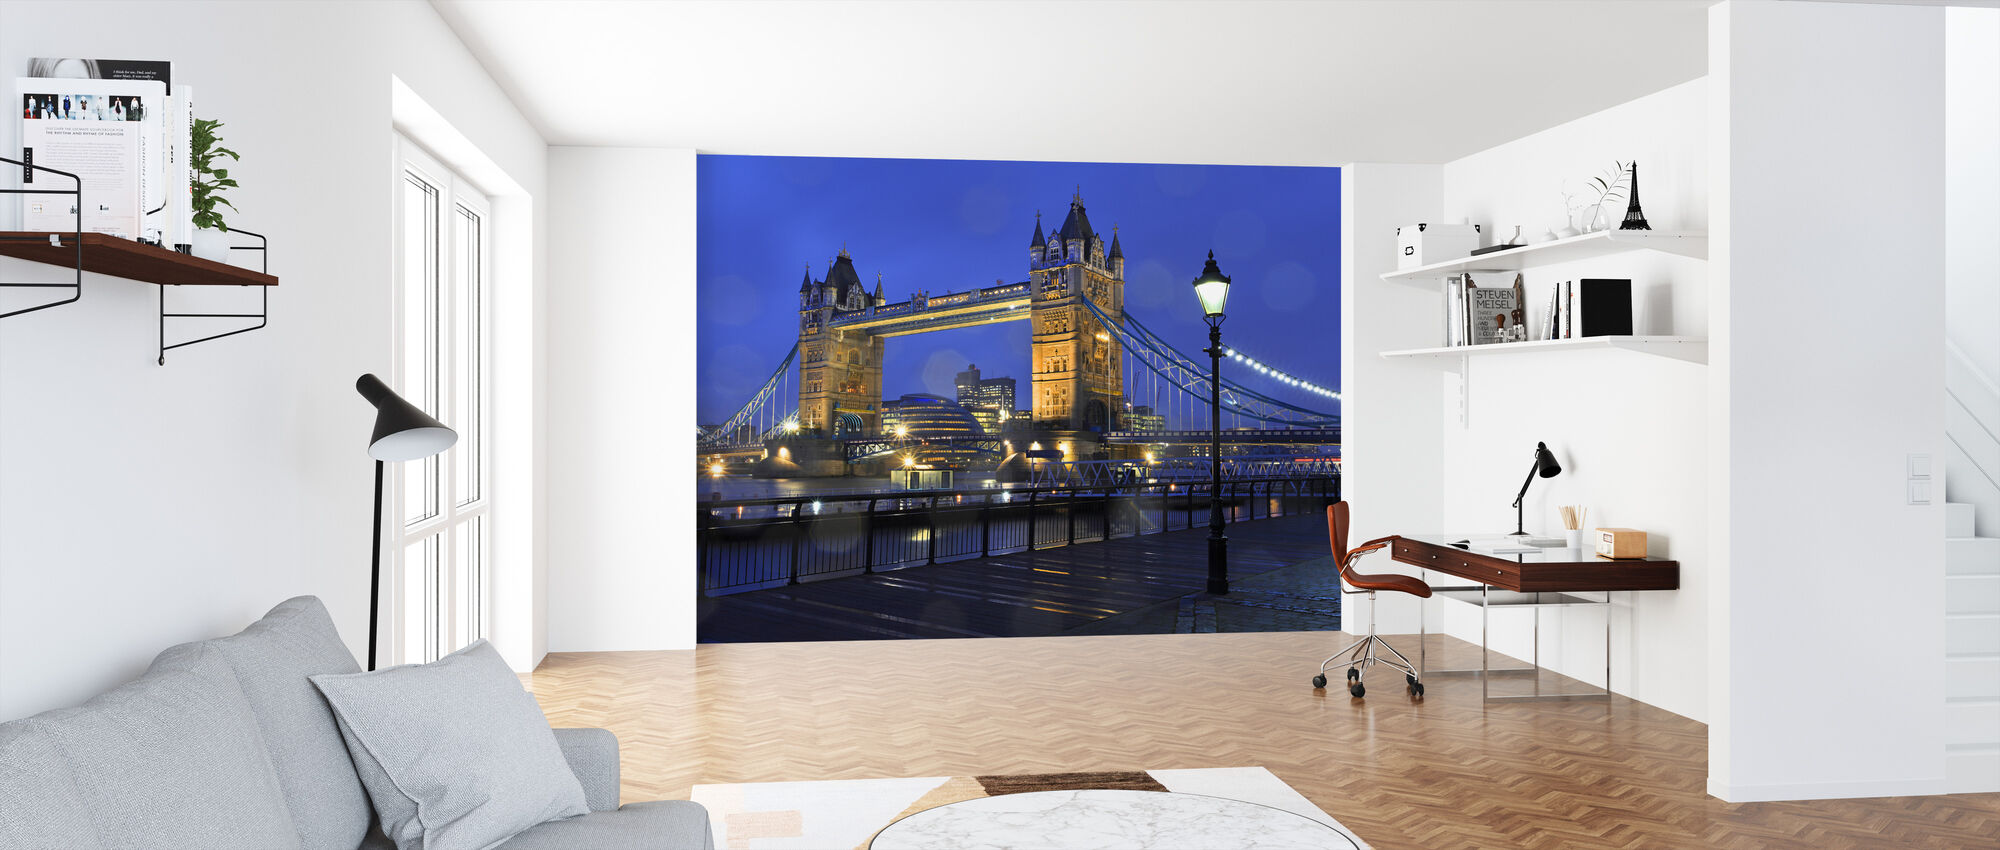 Tower Bridge Londres - Papel pintado - Oficina